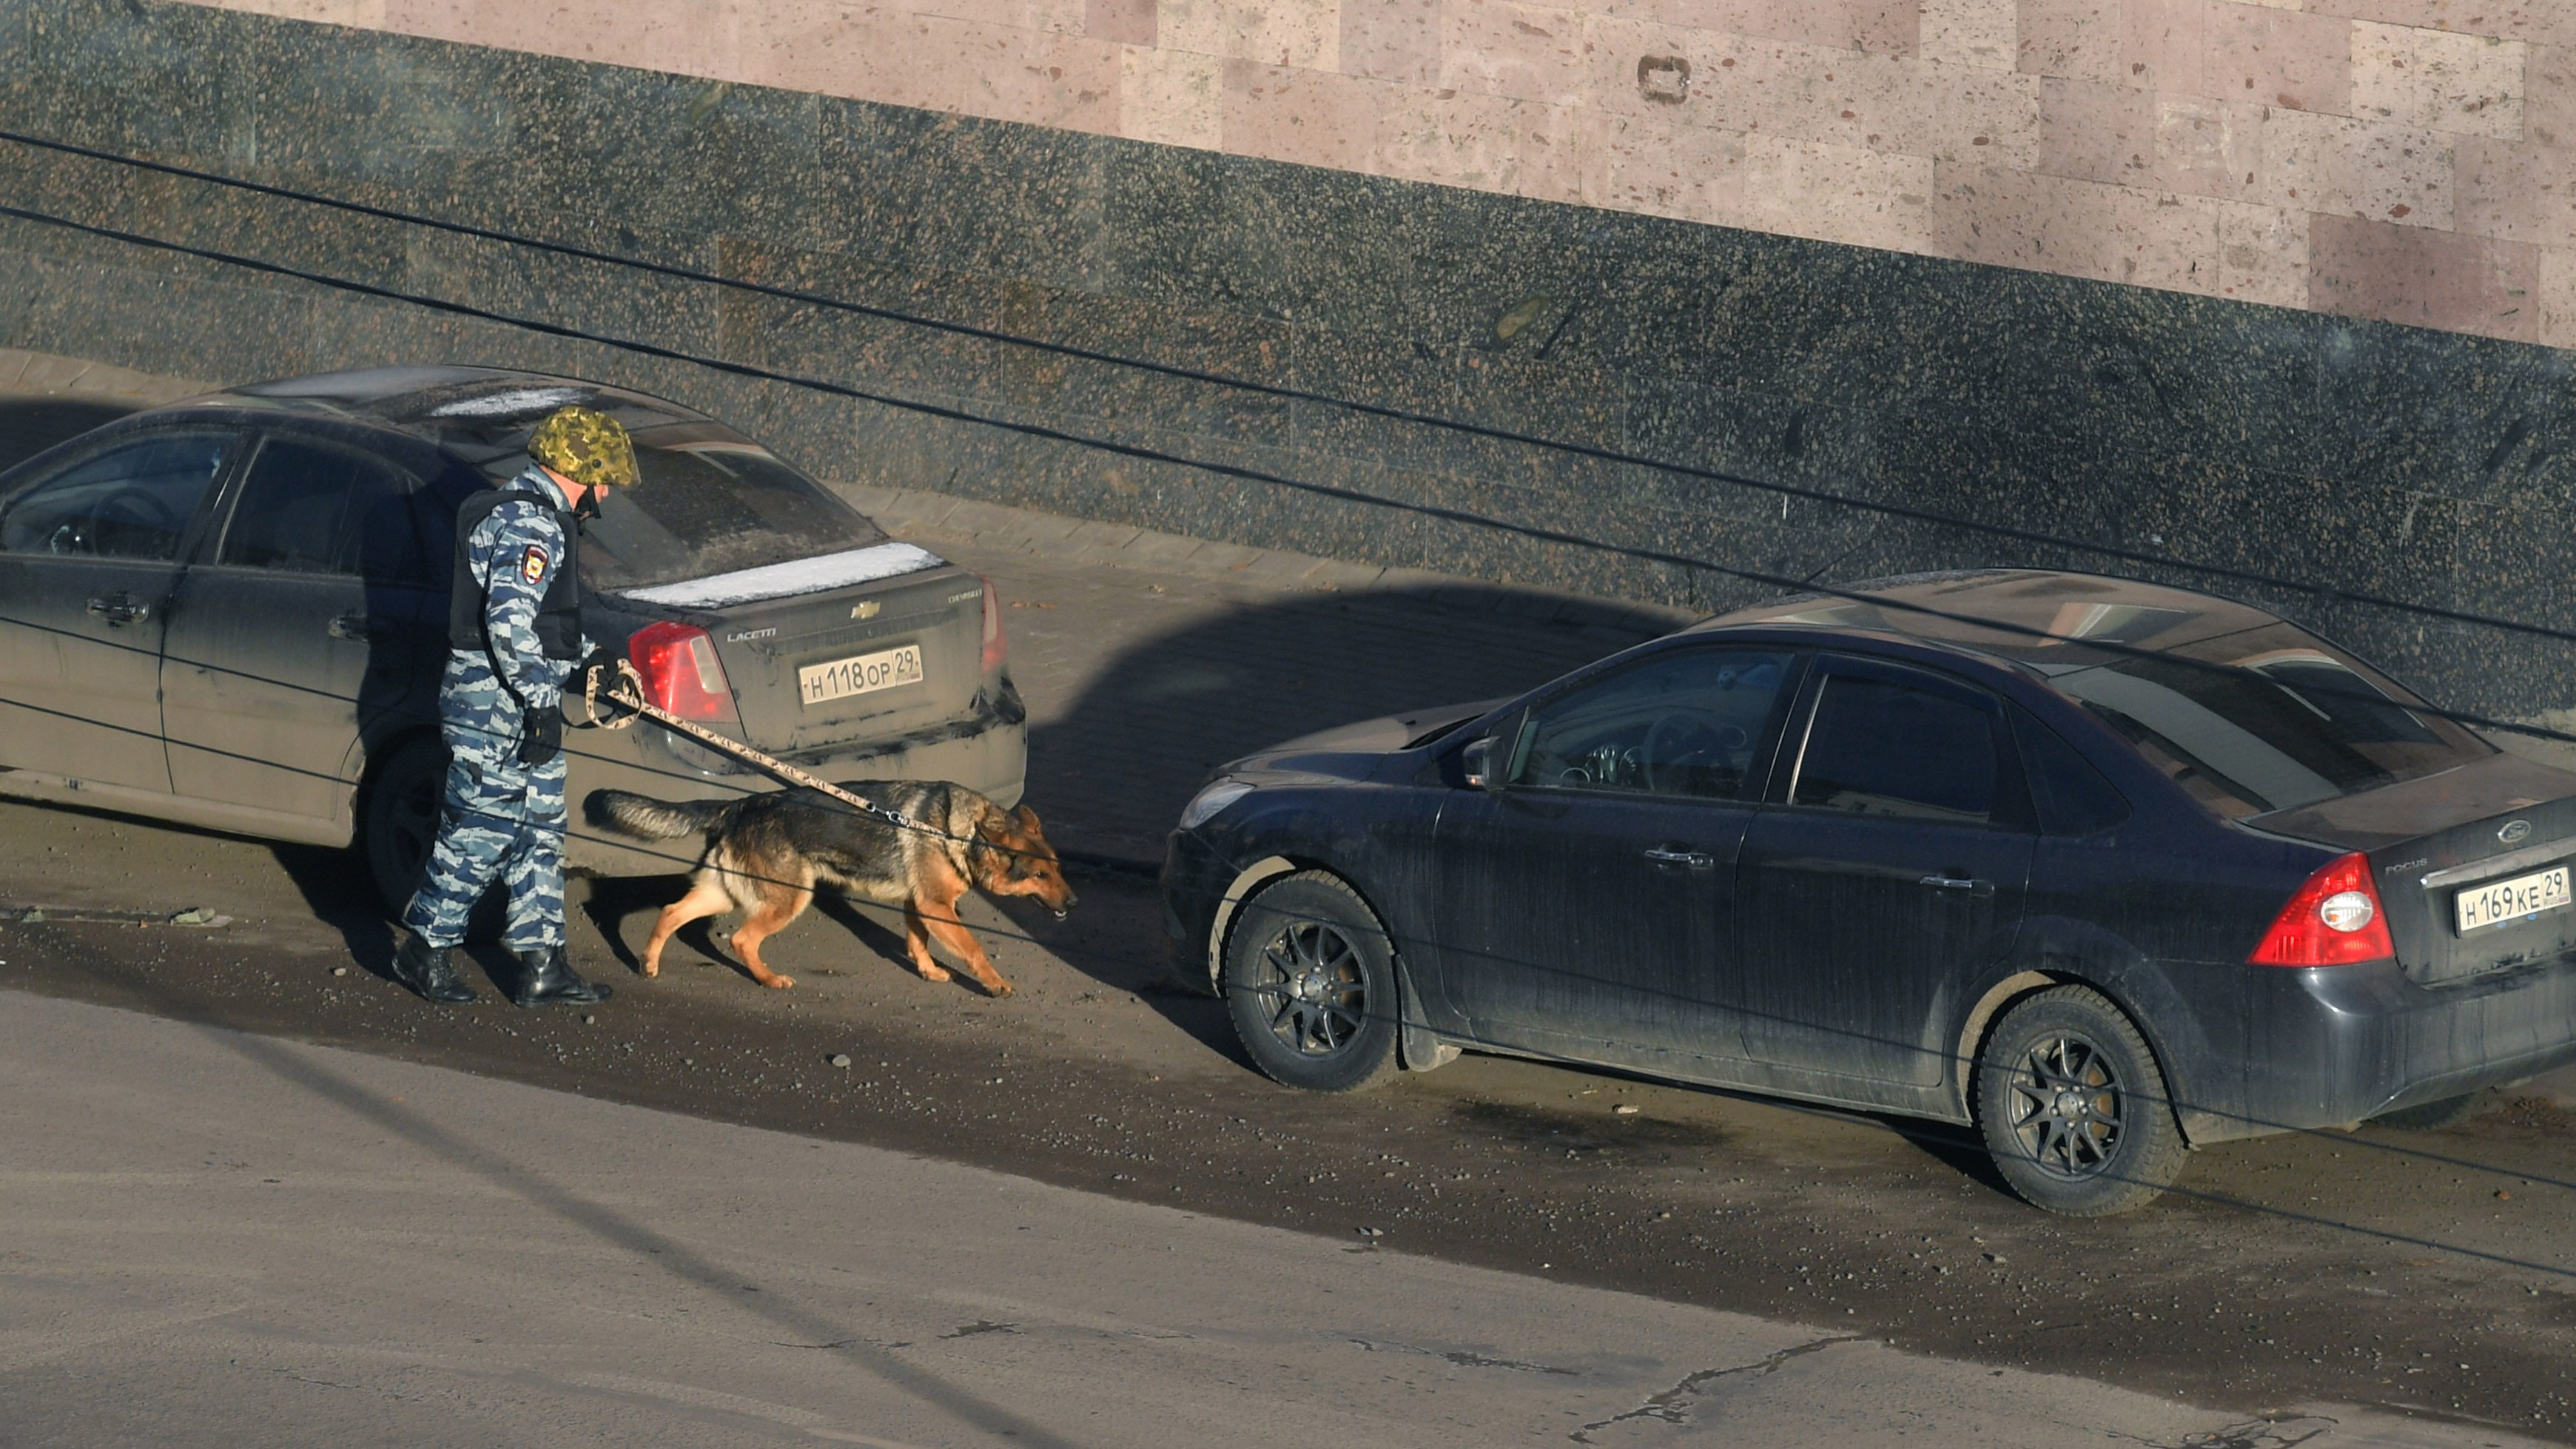 Фото © РИА Новости / Владимир Трефилов